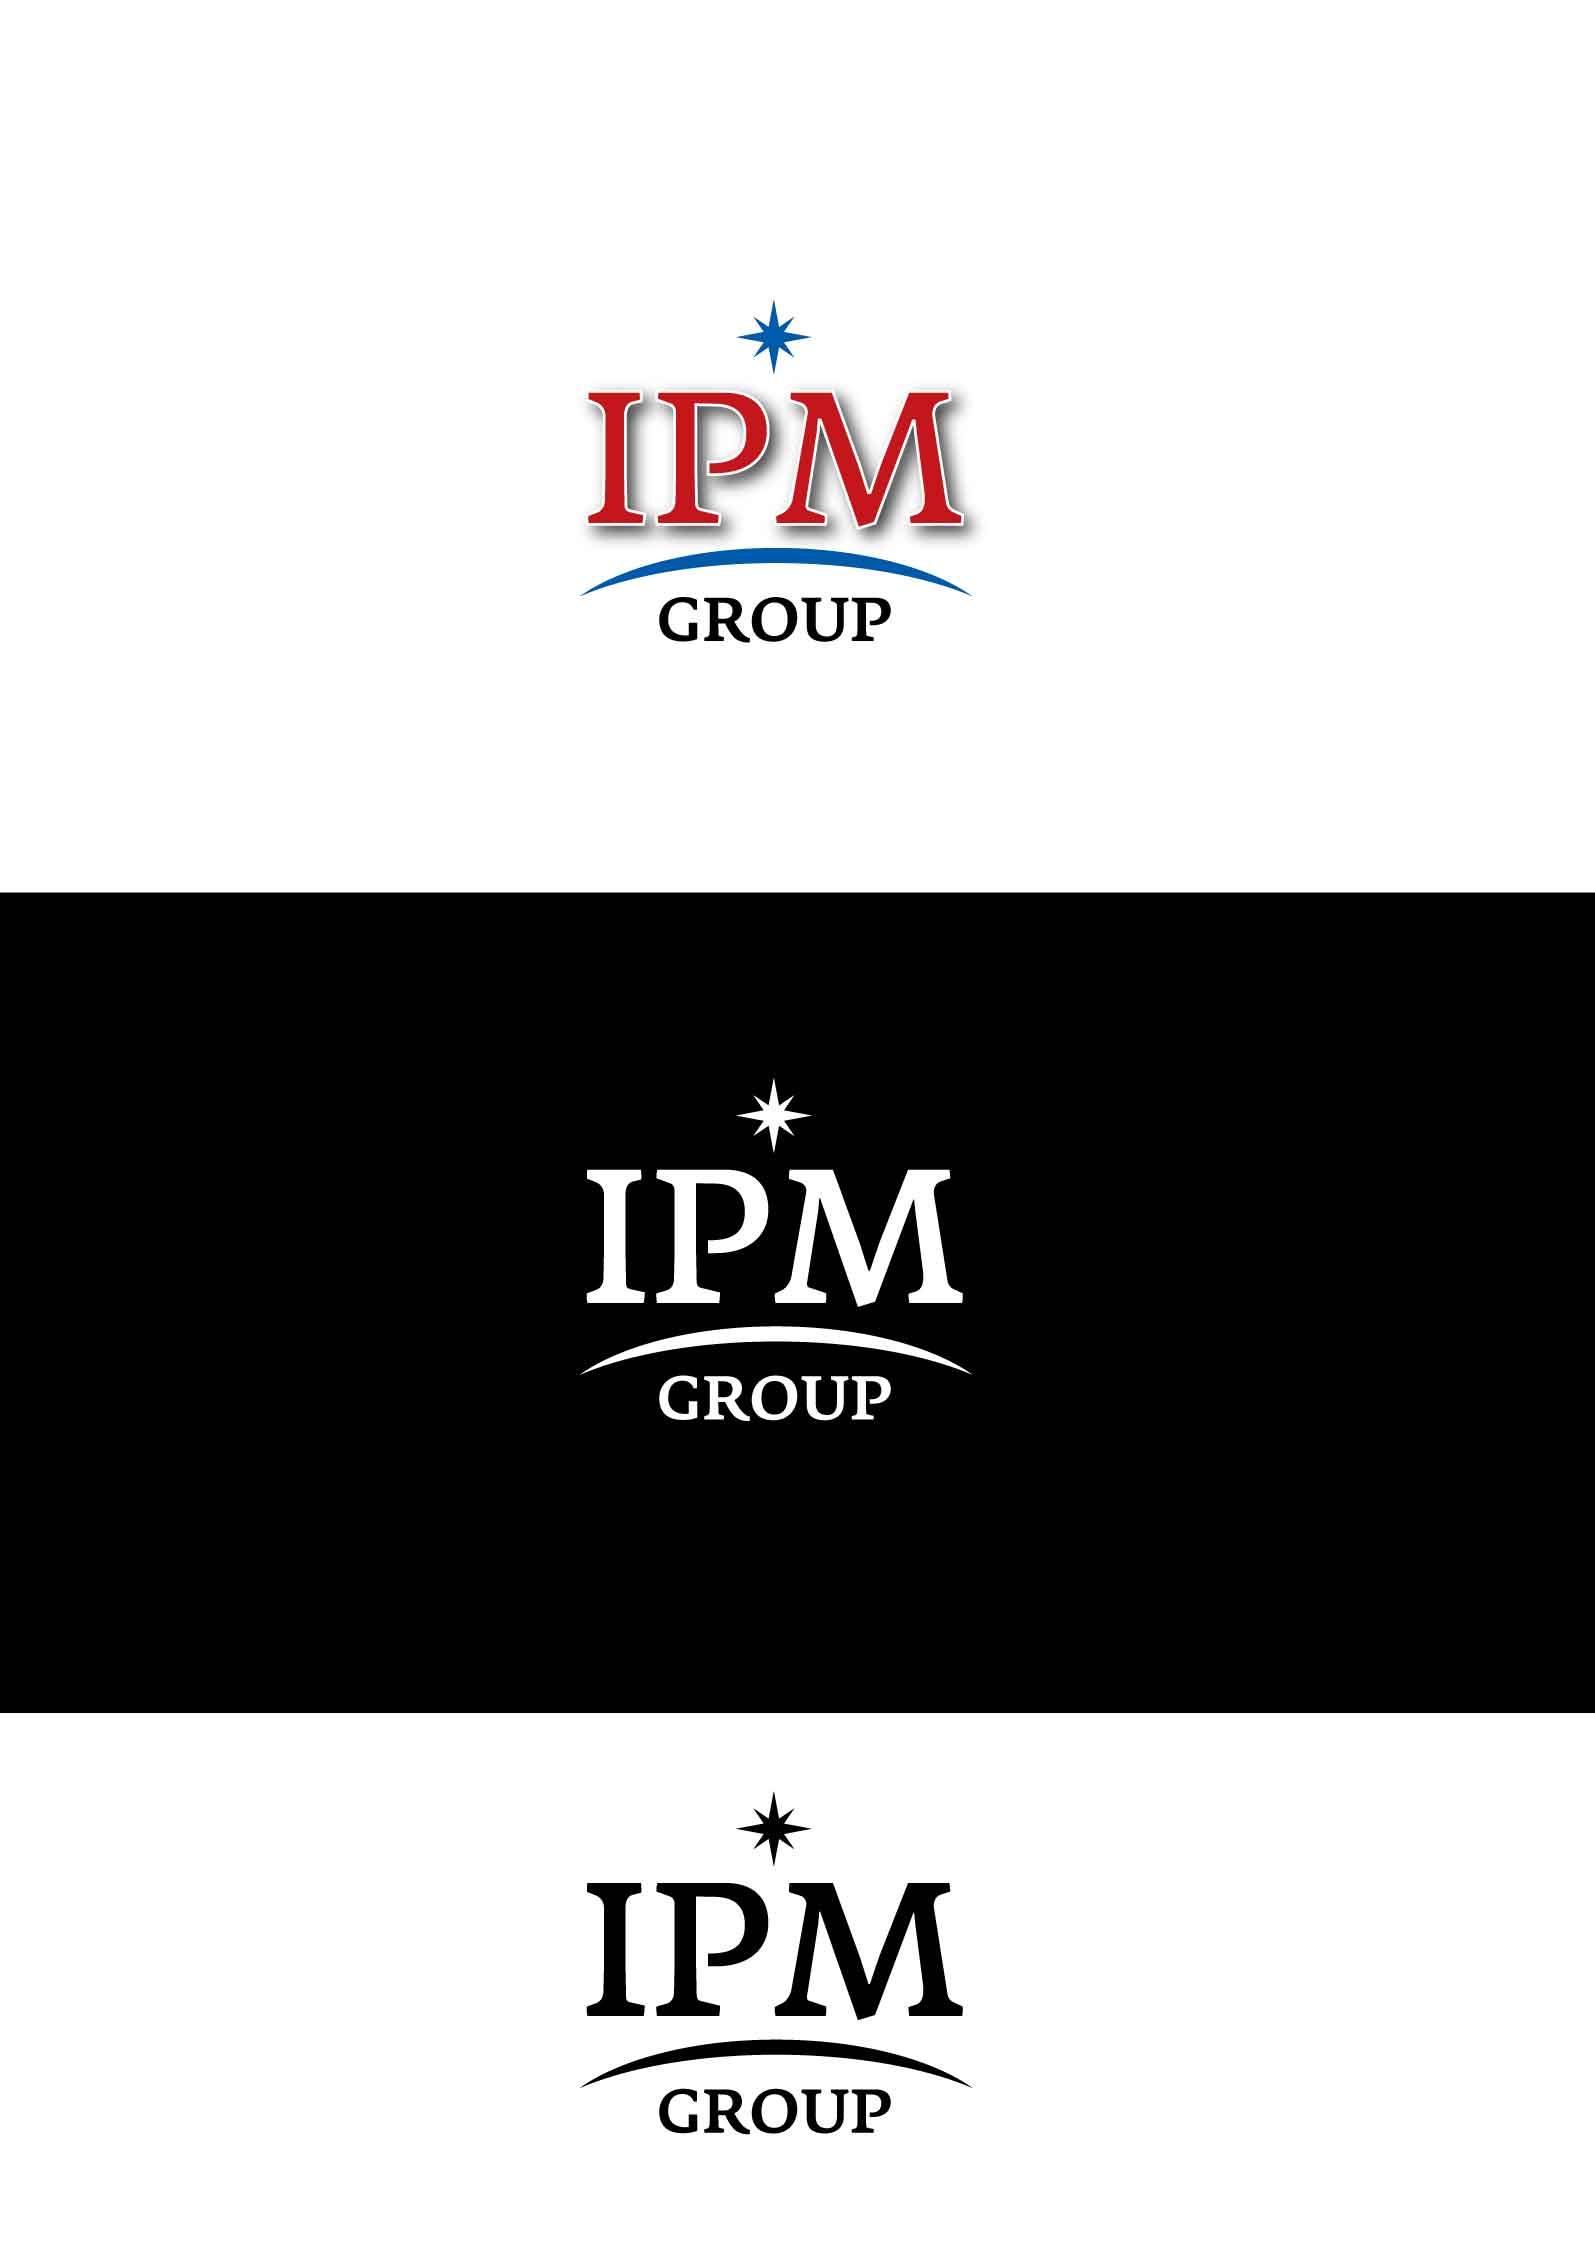 Разработка логотипа для управляющей компании фото f_1845f8613bc053dc.jpg